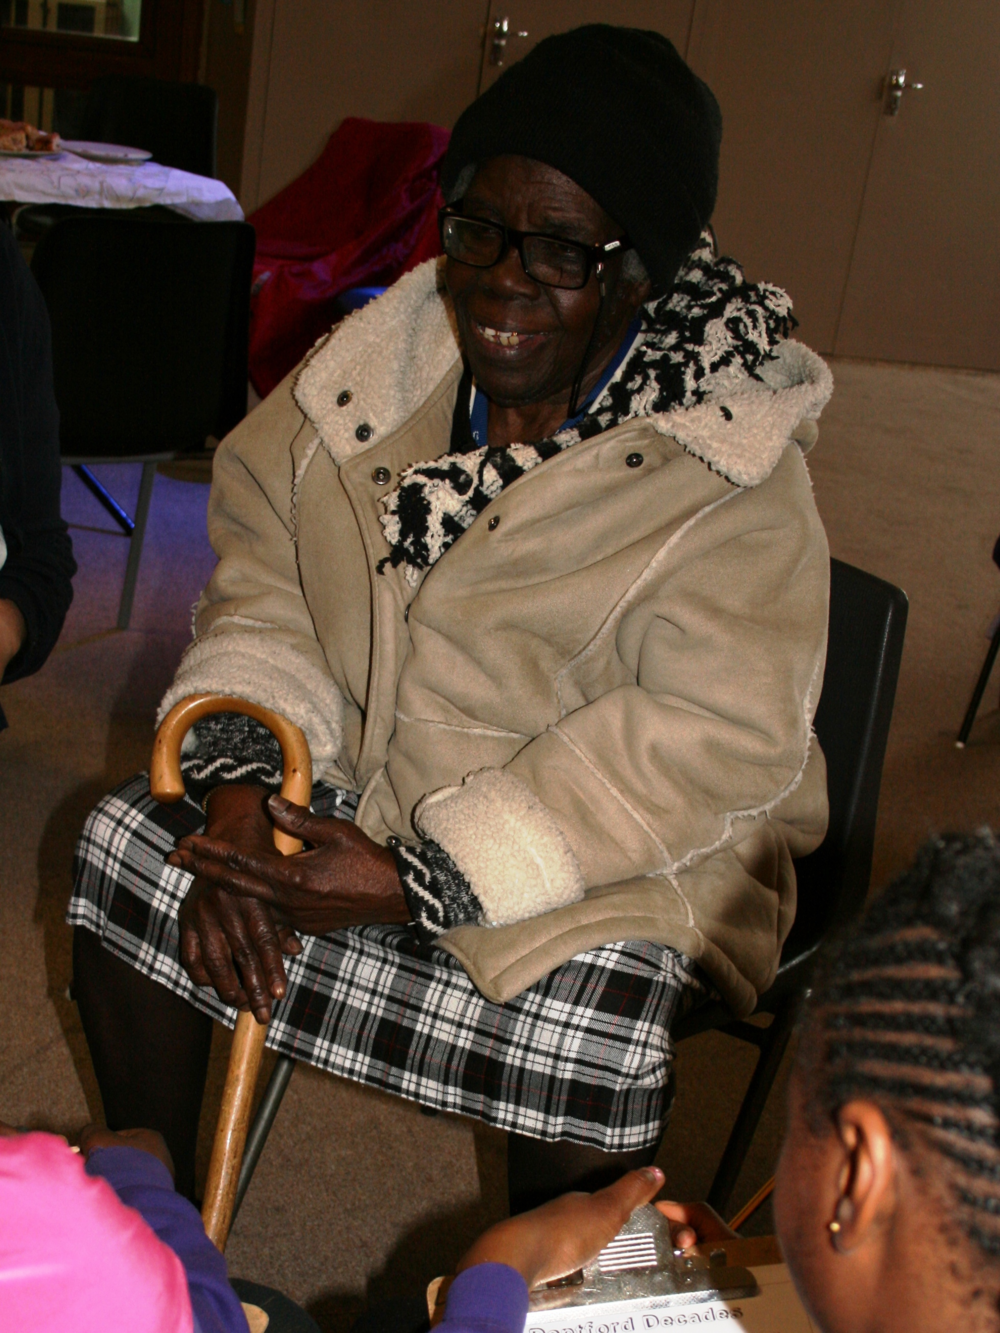 Ethel Charlton